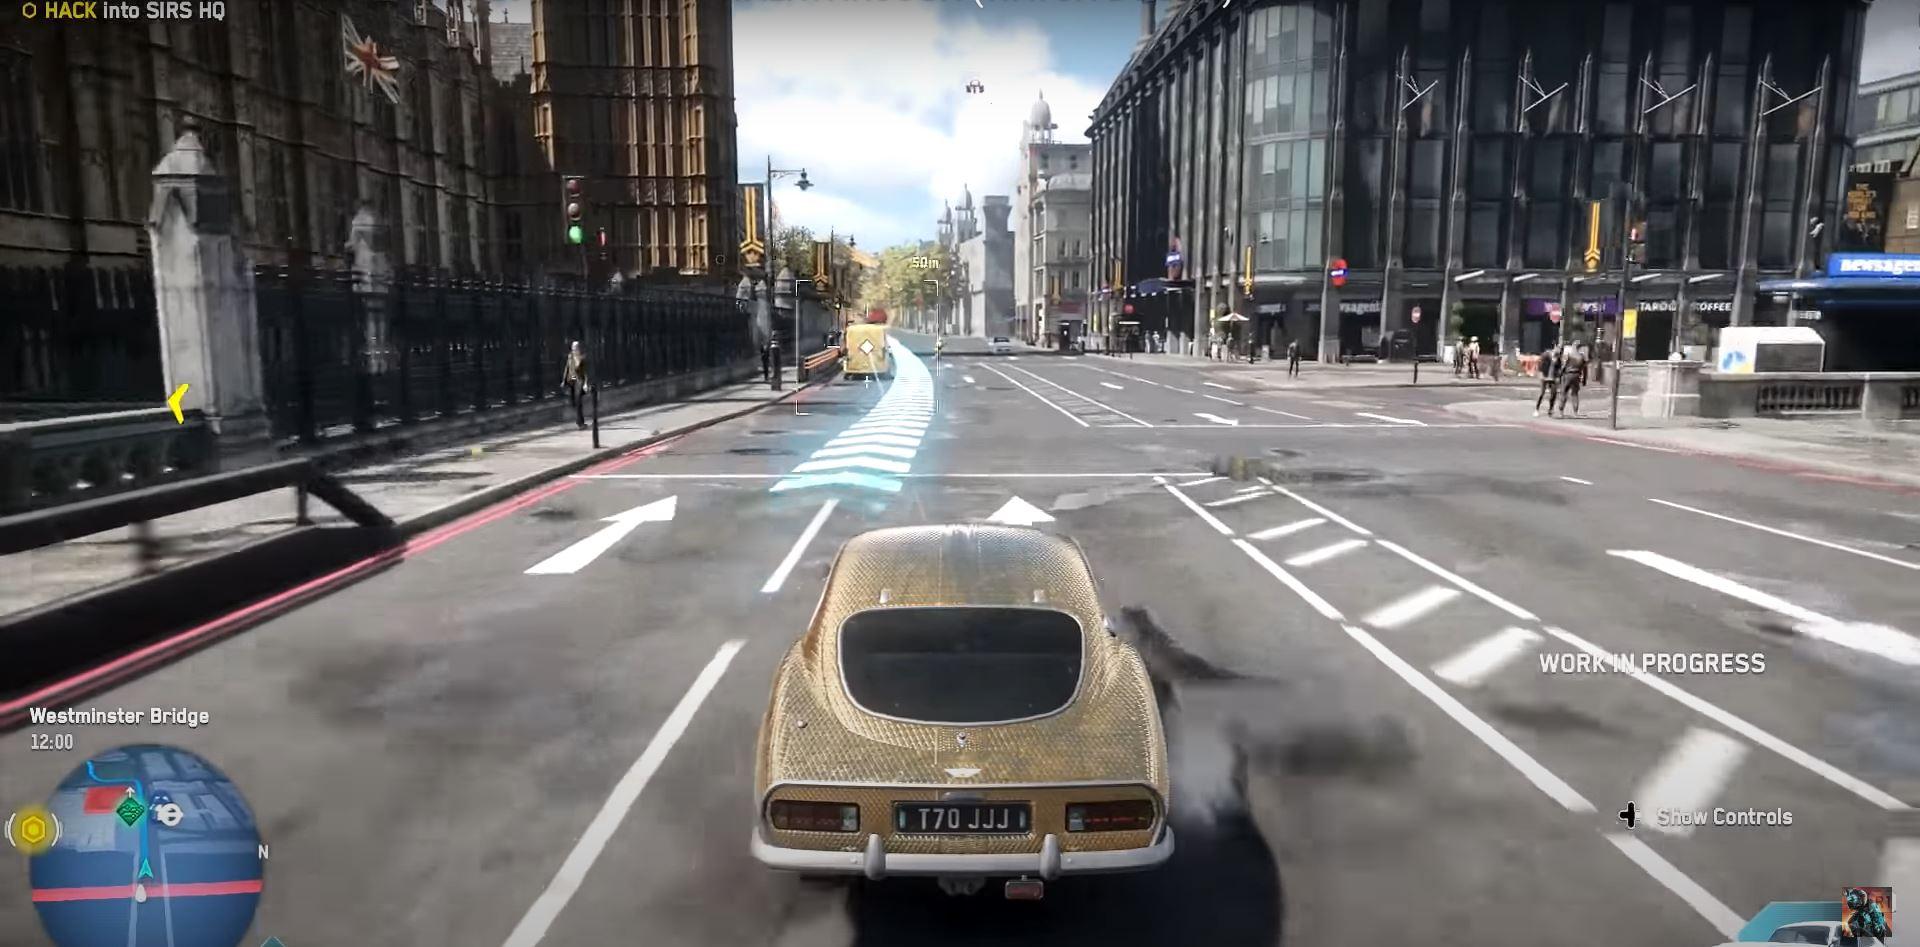 Watch Dogs Legions driving through London